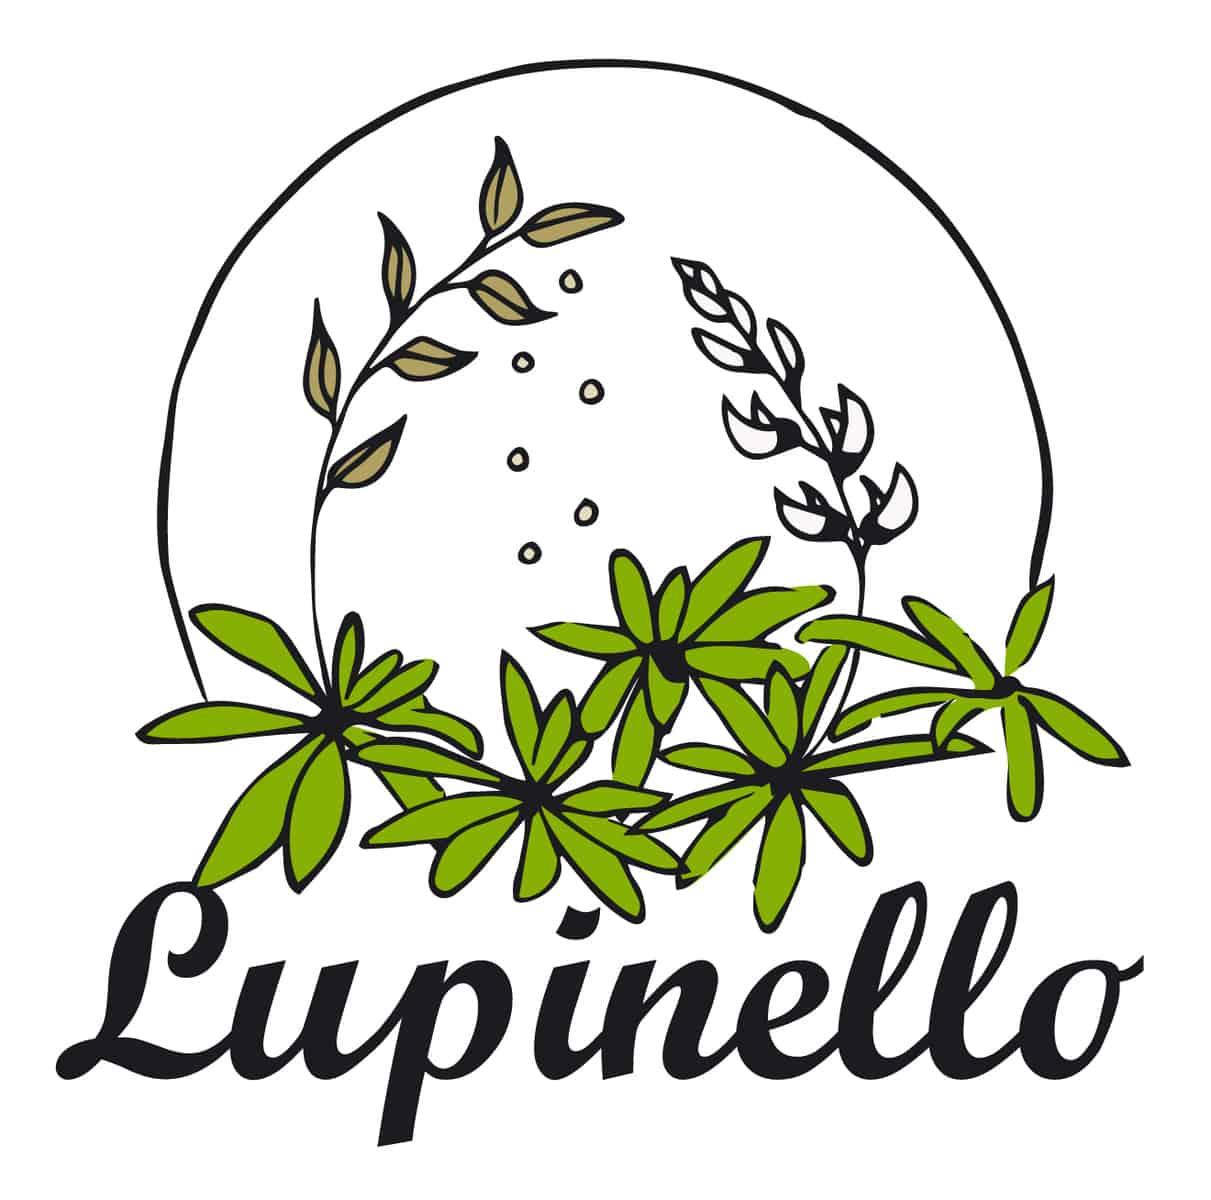 Lupinello